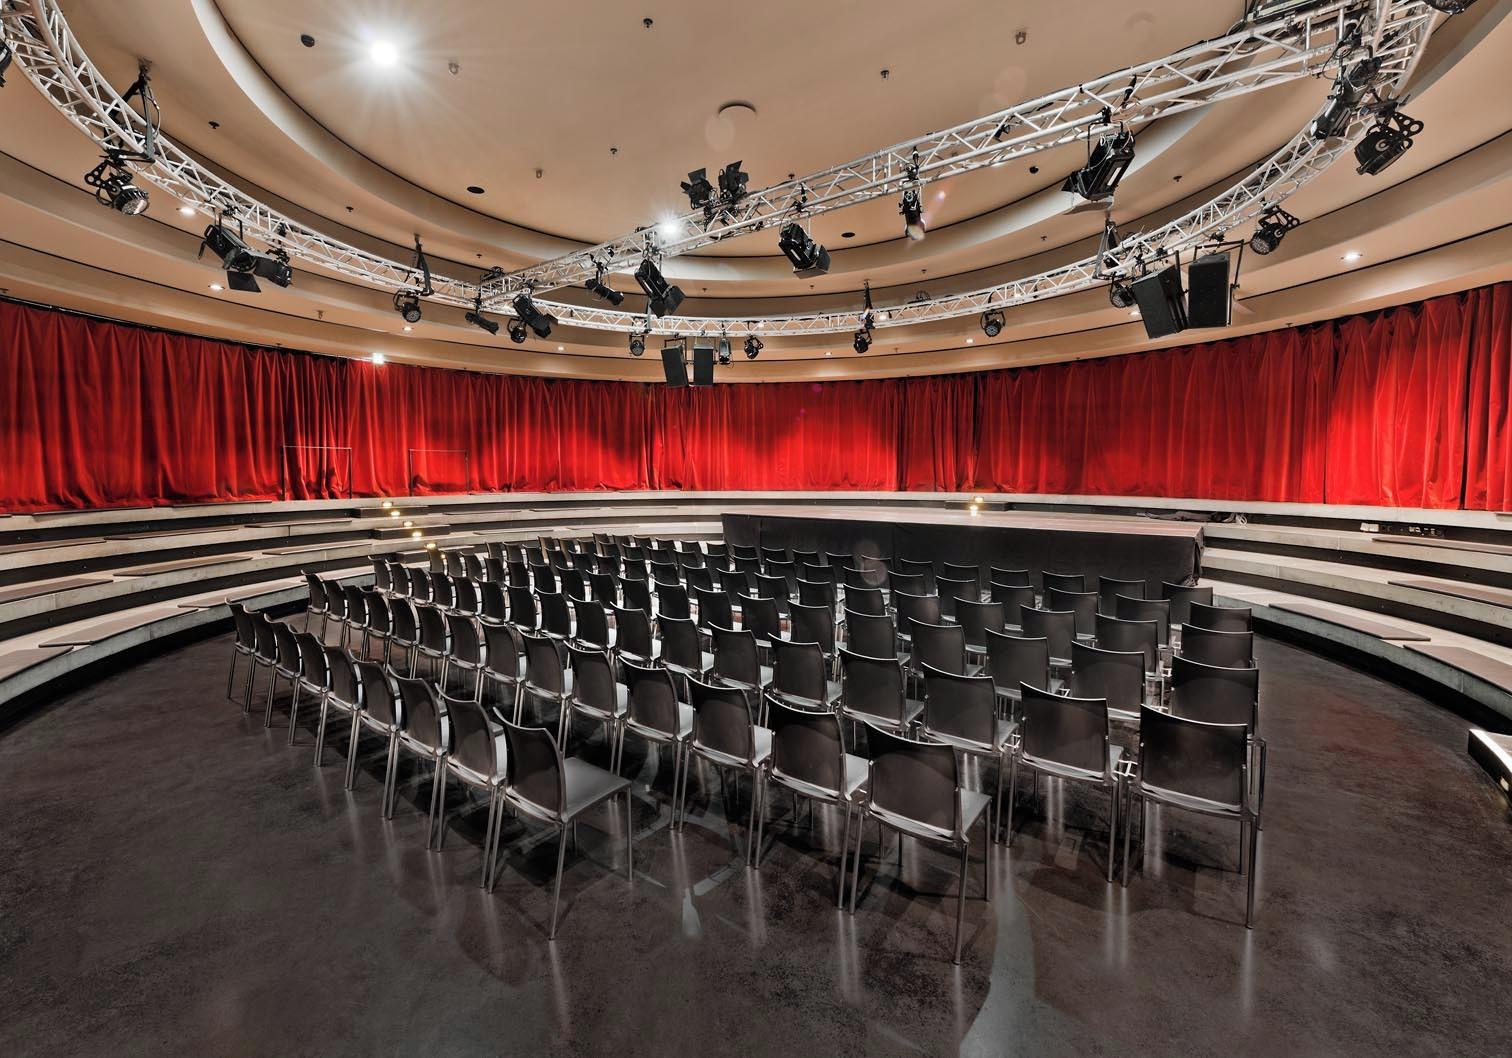 Tempodrom - Kleine Arena mieten in Berlin